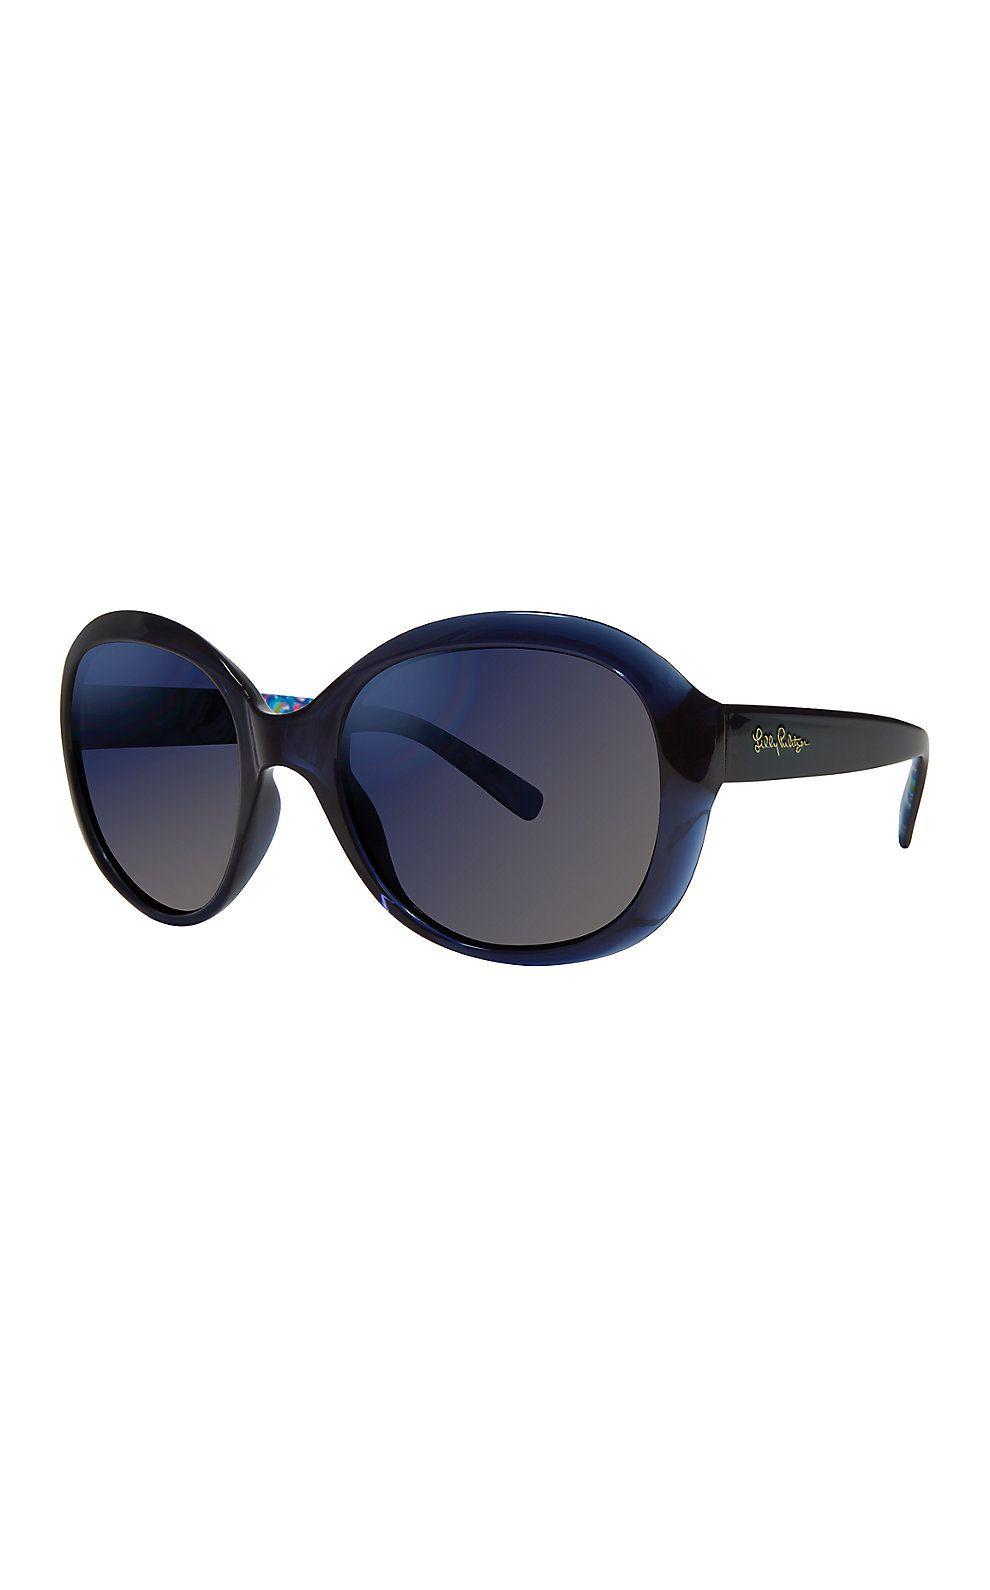 Lilly Pulitzer Magnolia Sunglasses   Pinterest 45712d2f9055